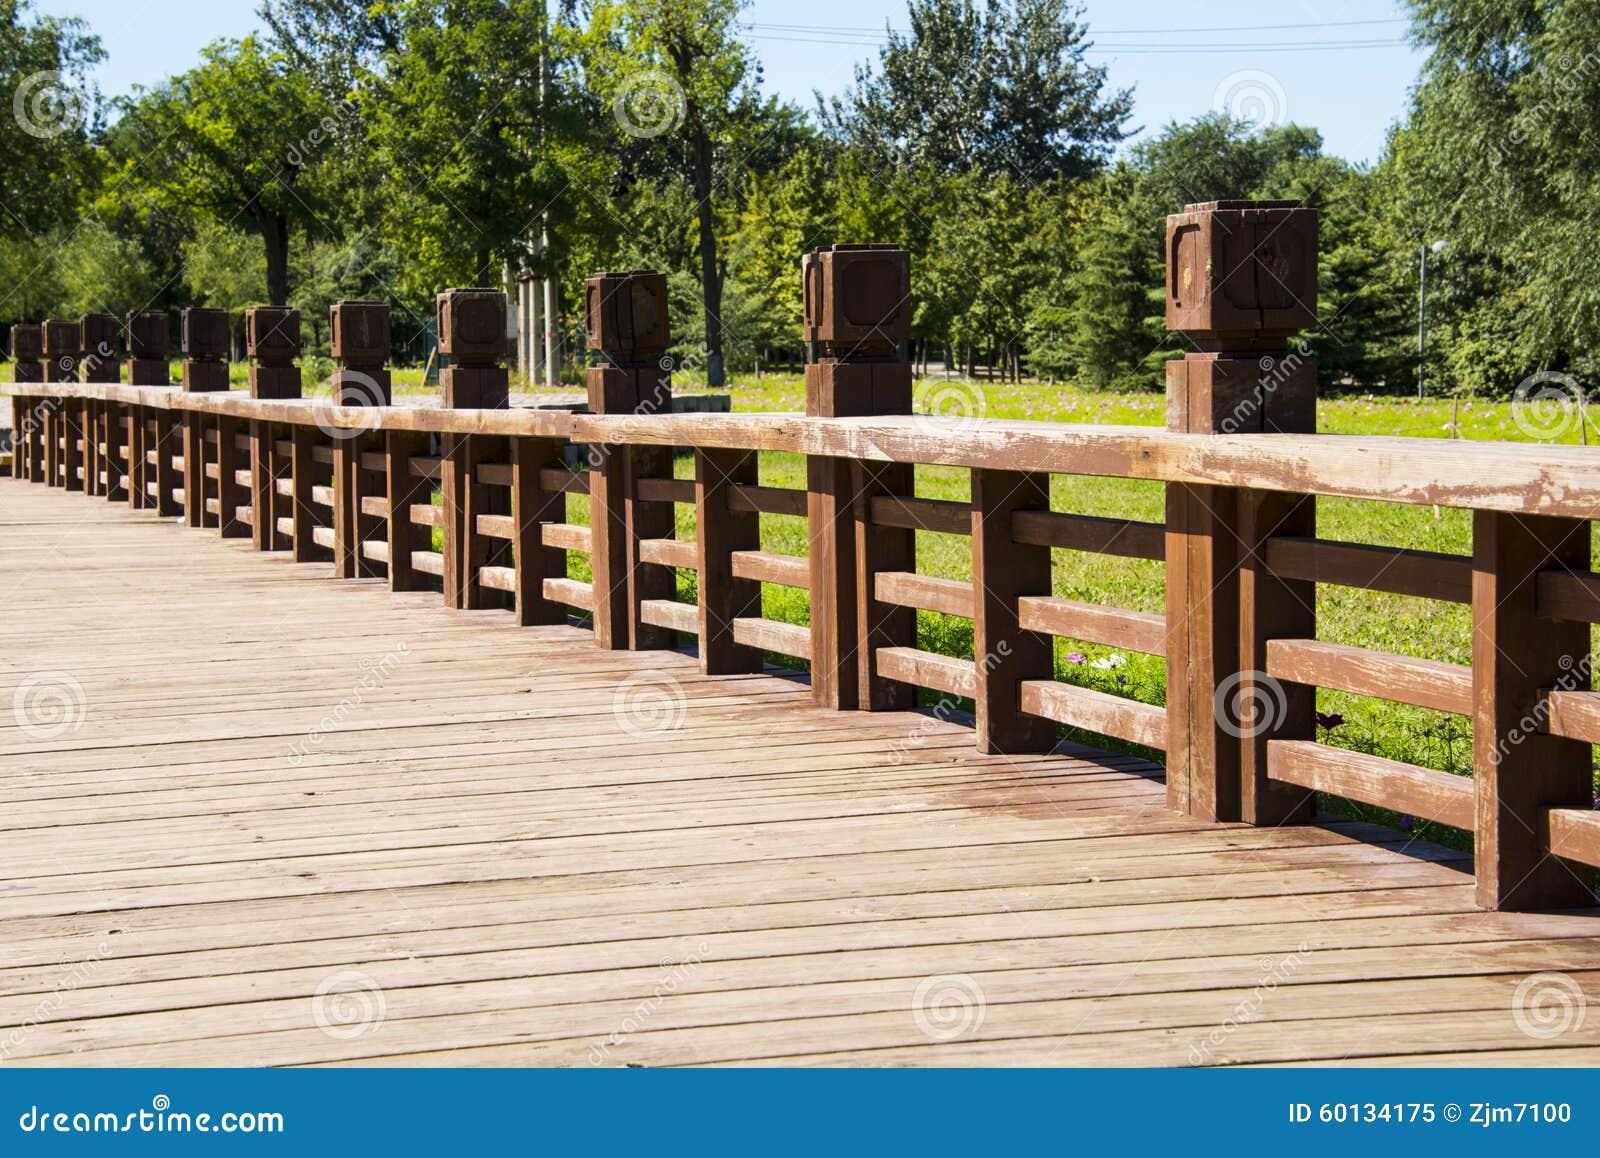 acera de madera verjas de madera imagen de archivo